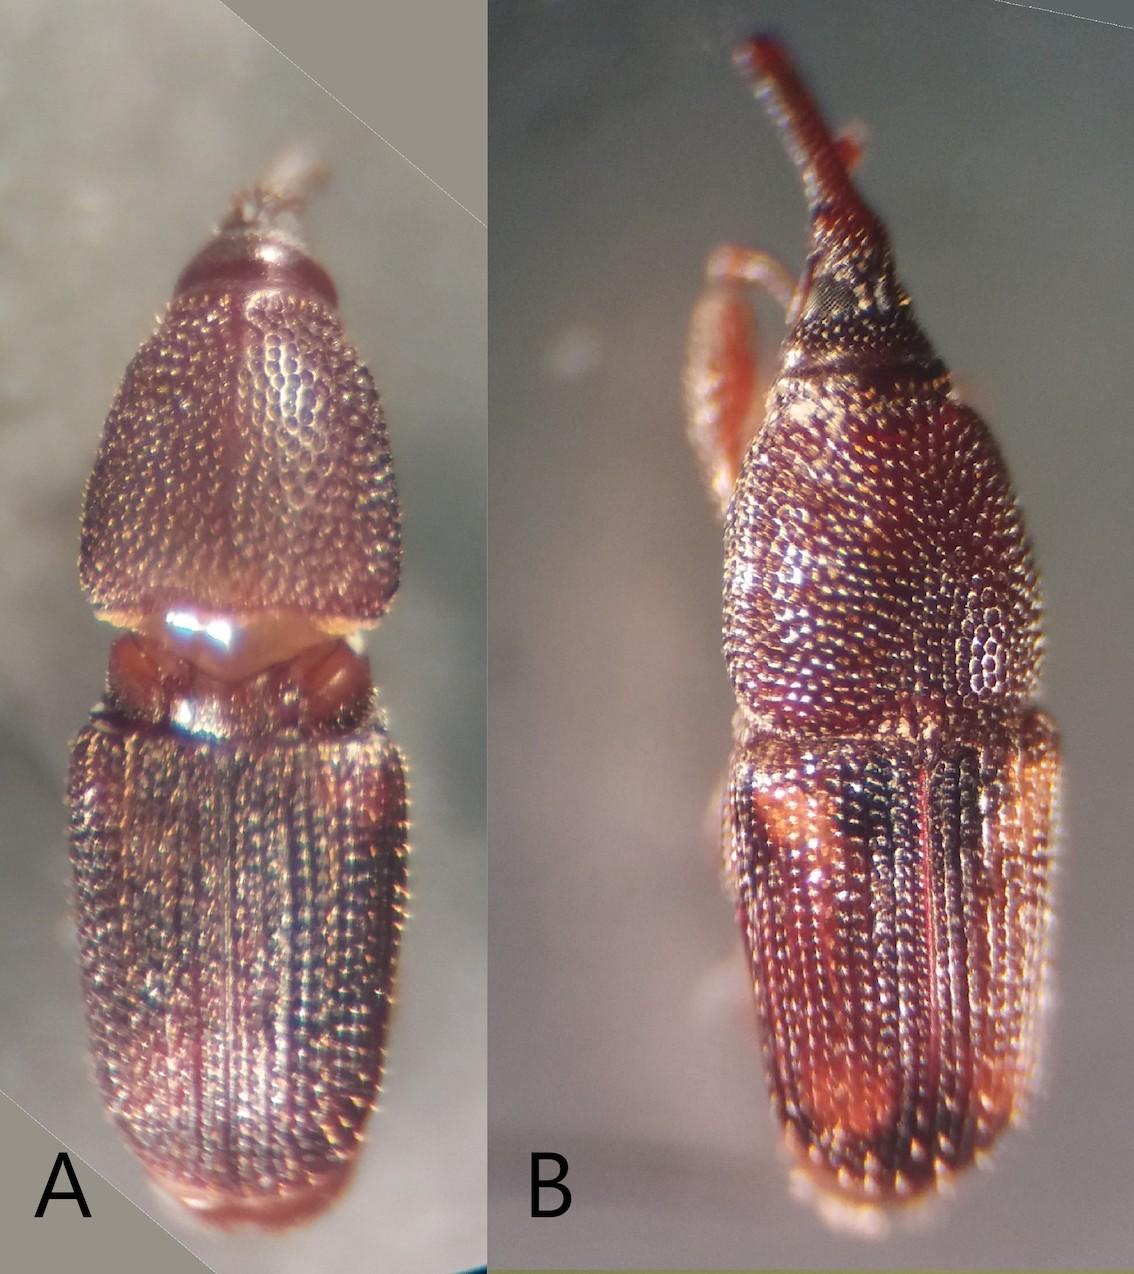 Como diferenciar Sitophilus oryzae de S. zeamais?